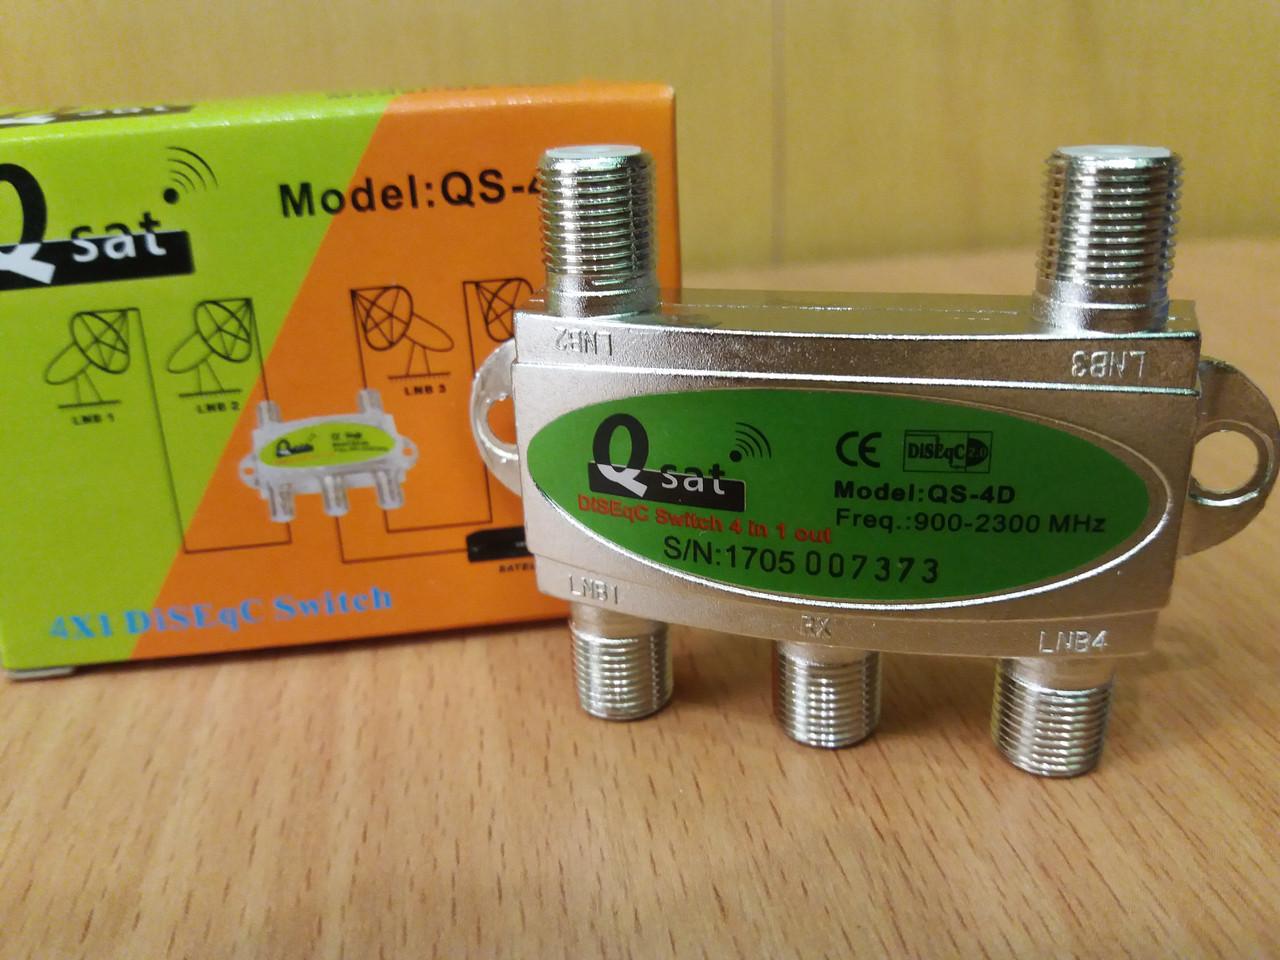 DISEqC Q-Sat QS-4D